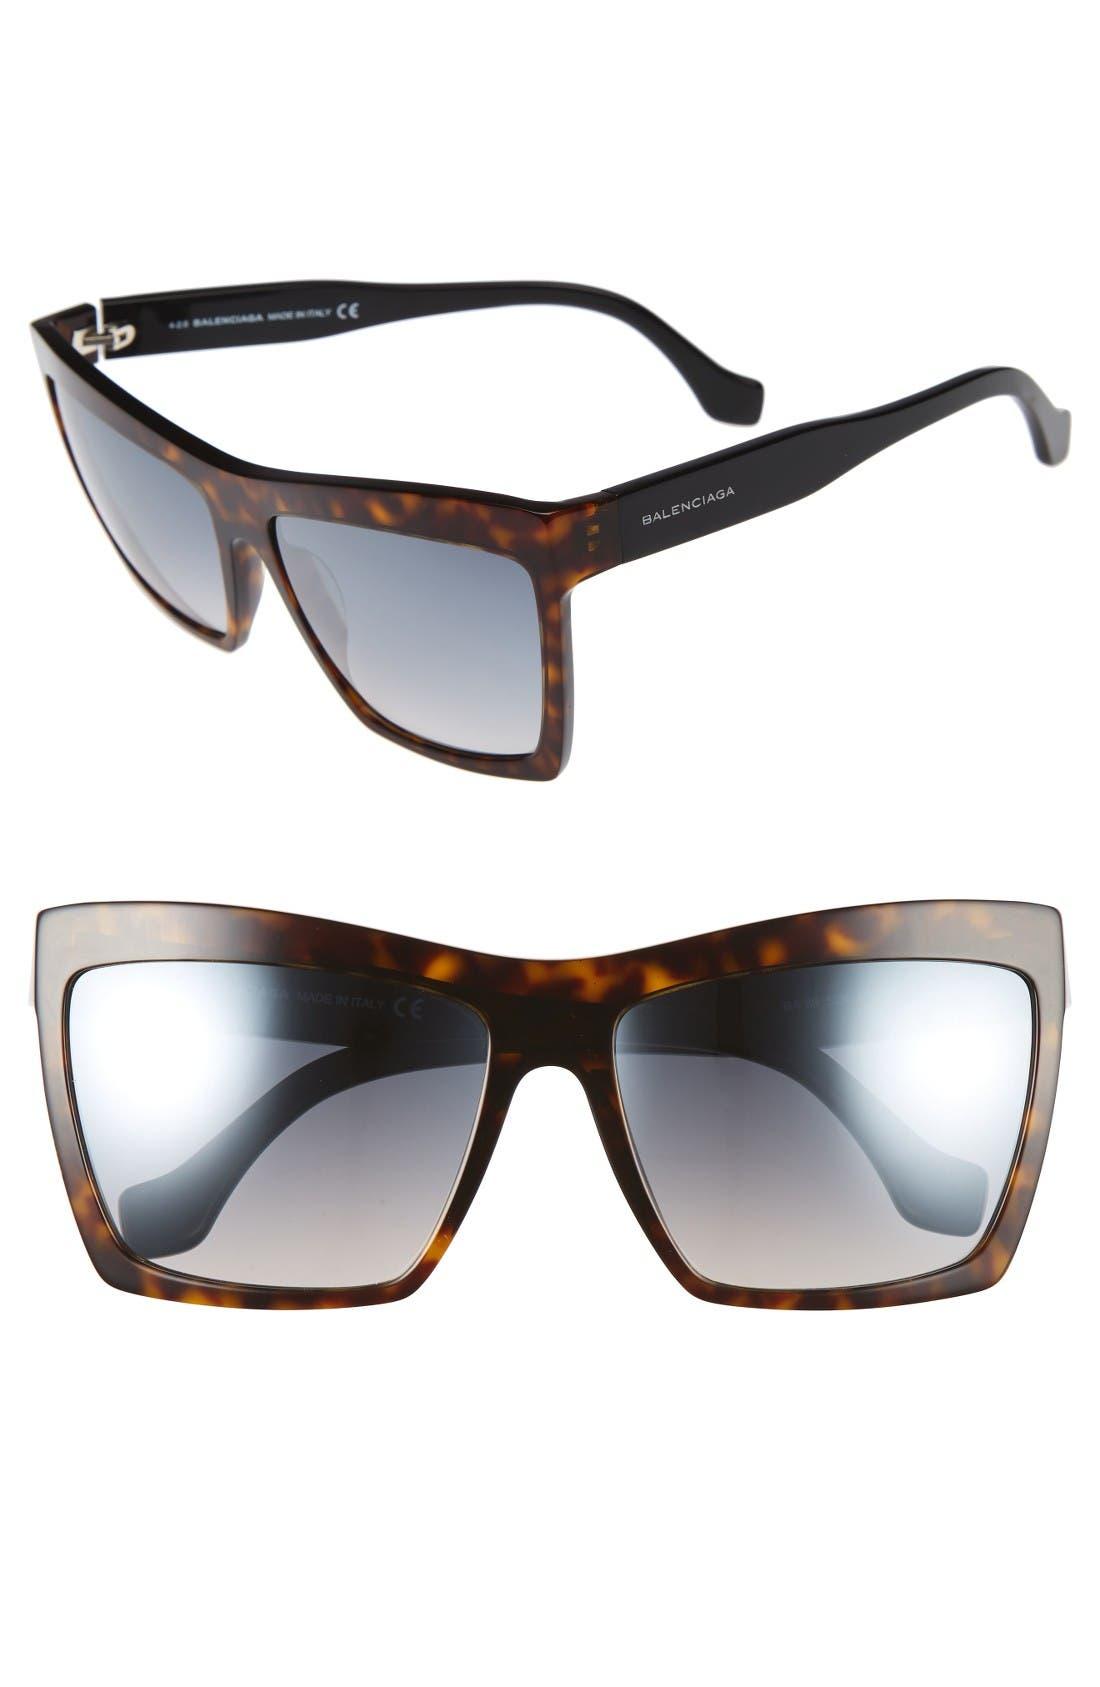 60mm Oversize Sunglasses,                             Main thumbnail 1, color,                             Havana/ Black/ Flash Azure